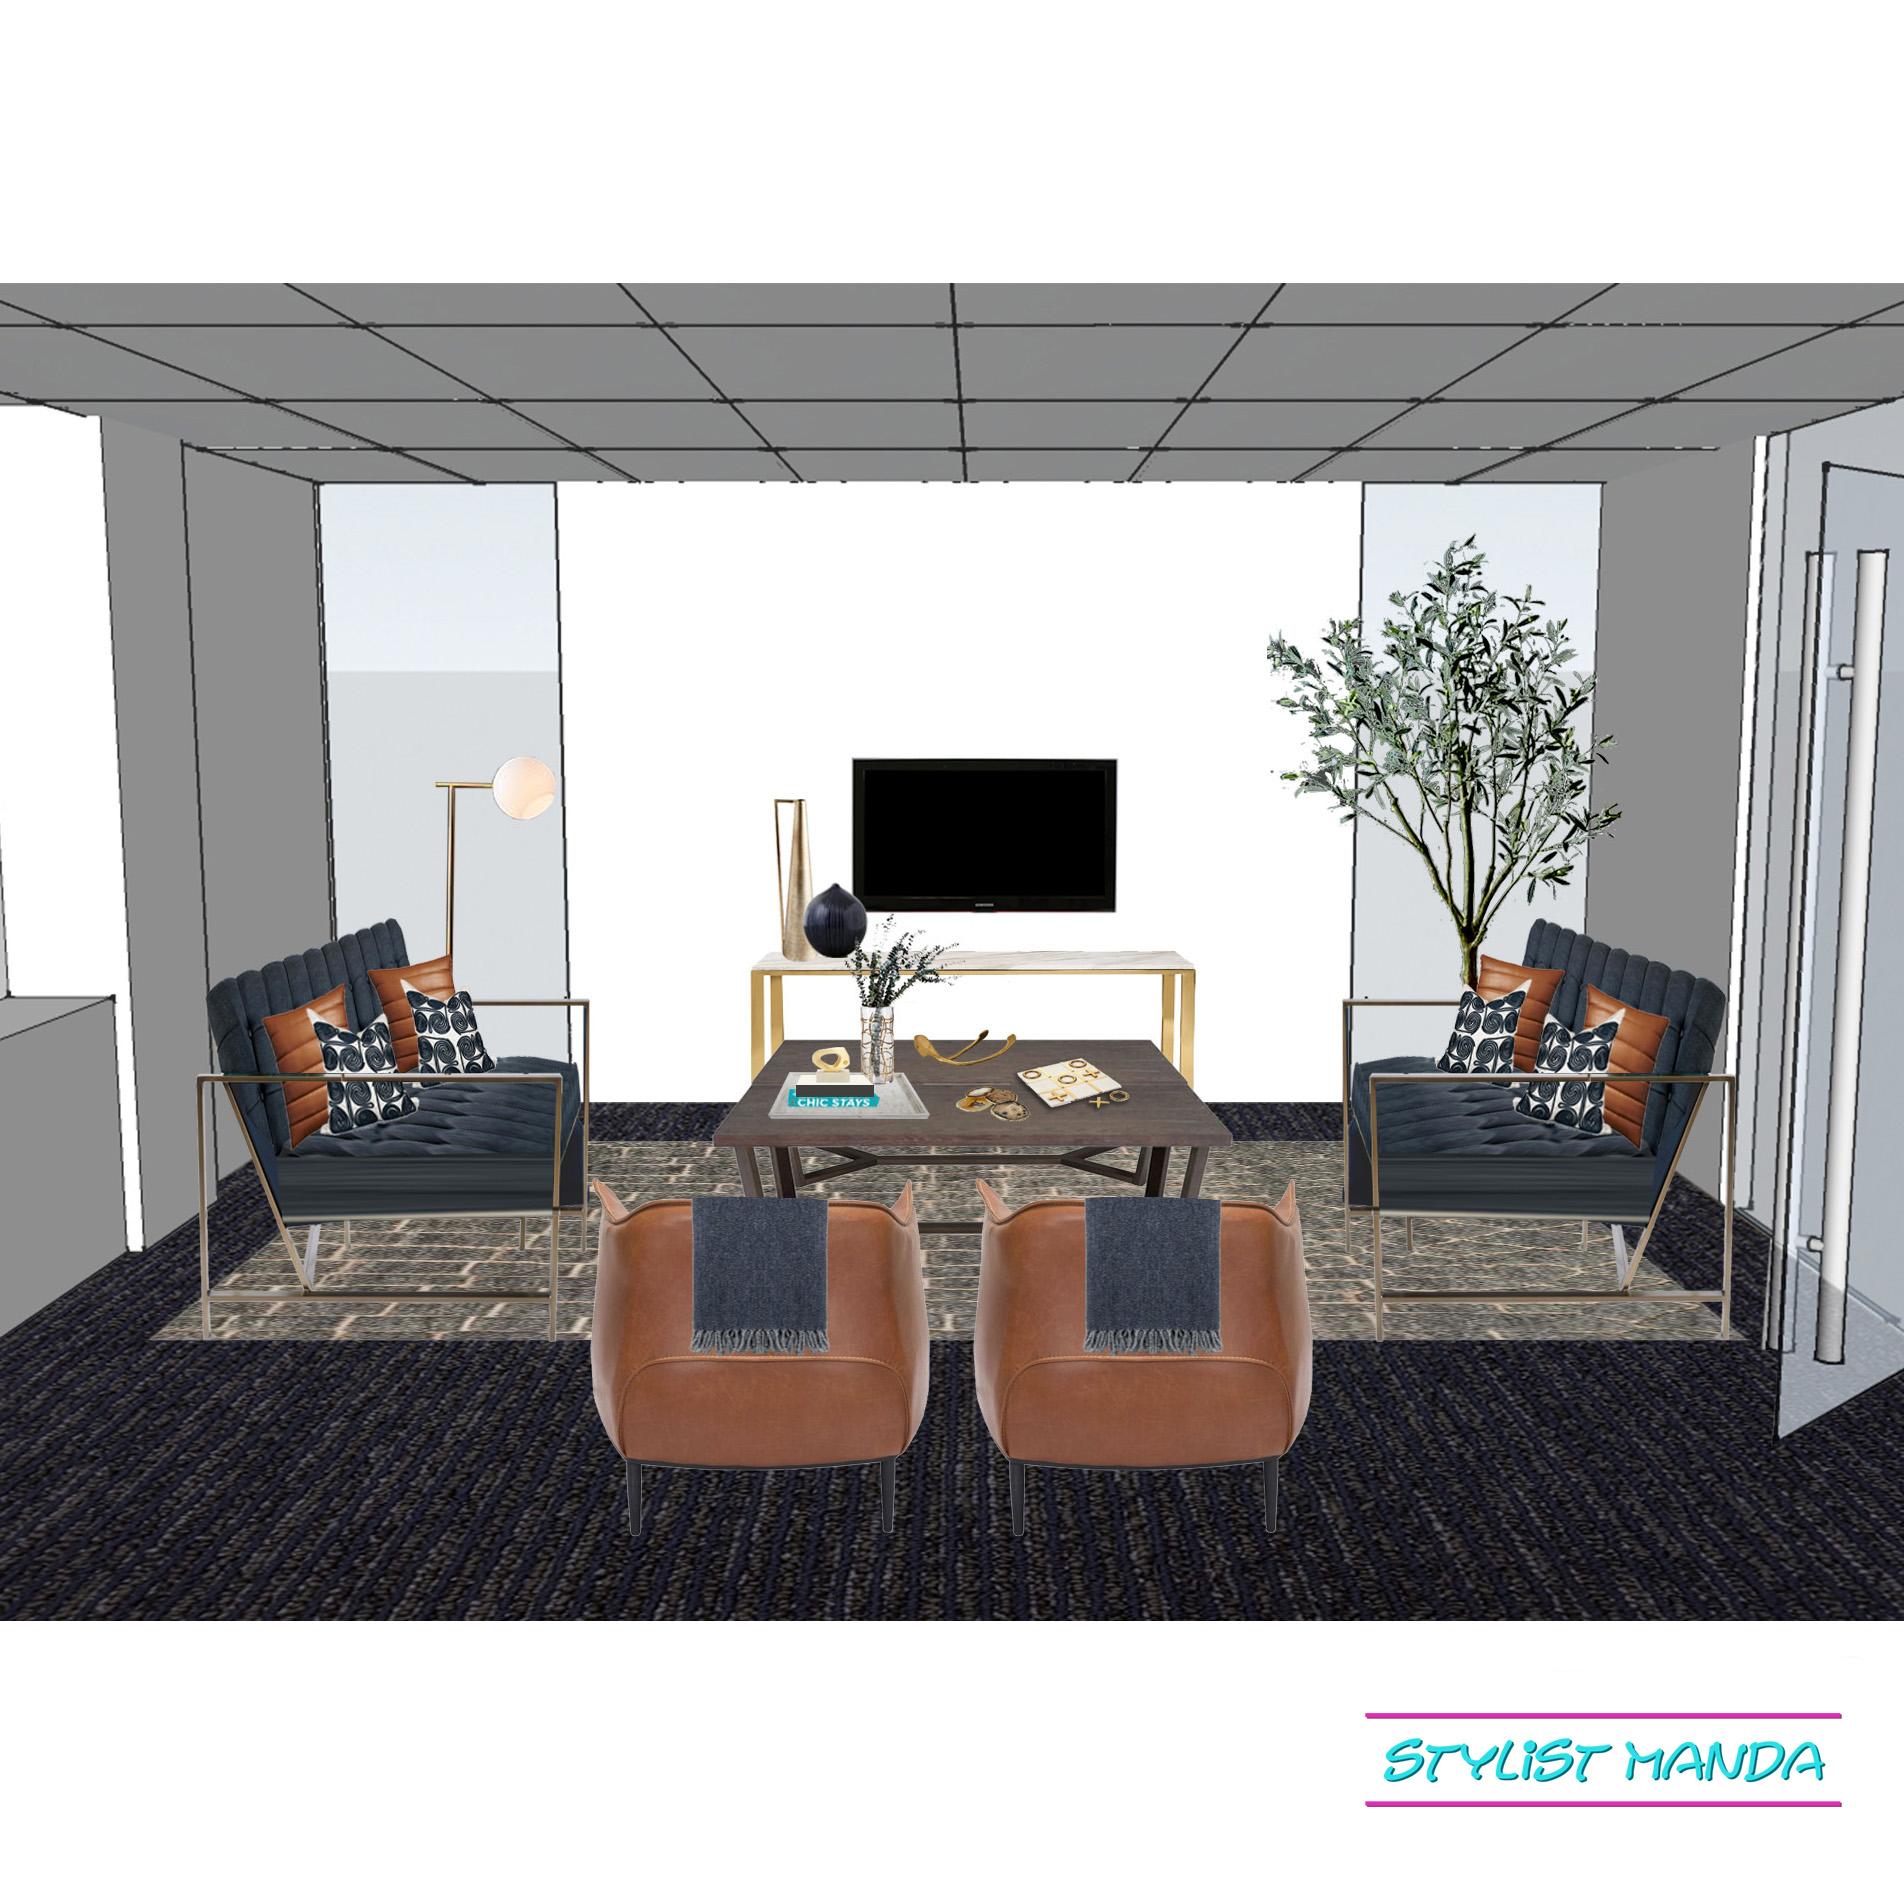 Room View Option 3